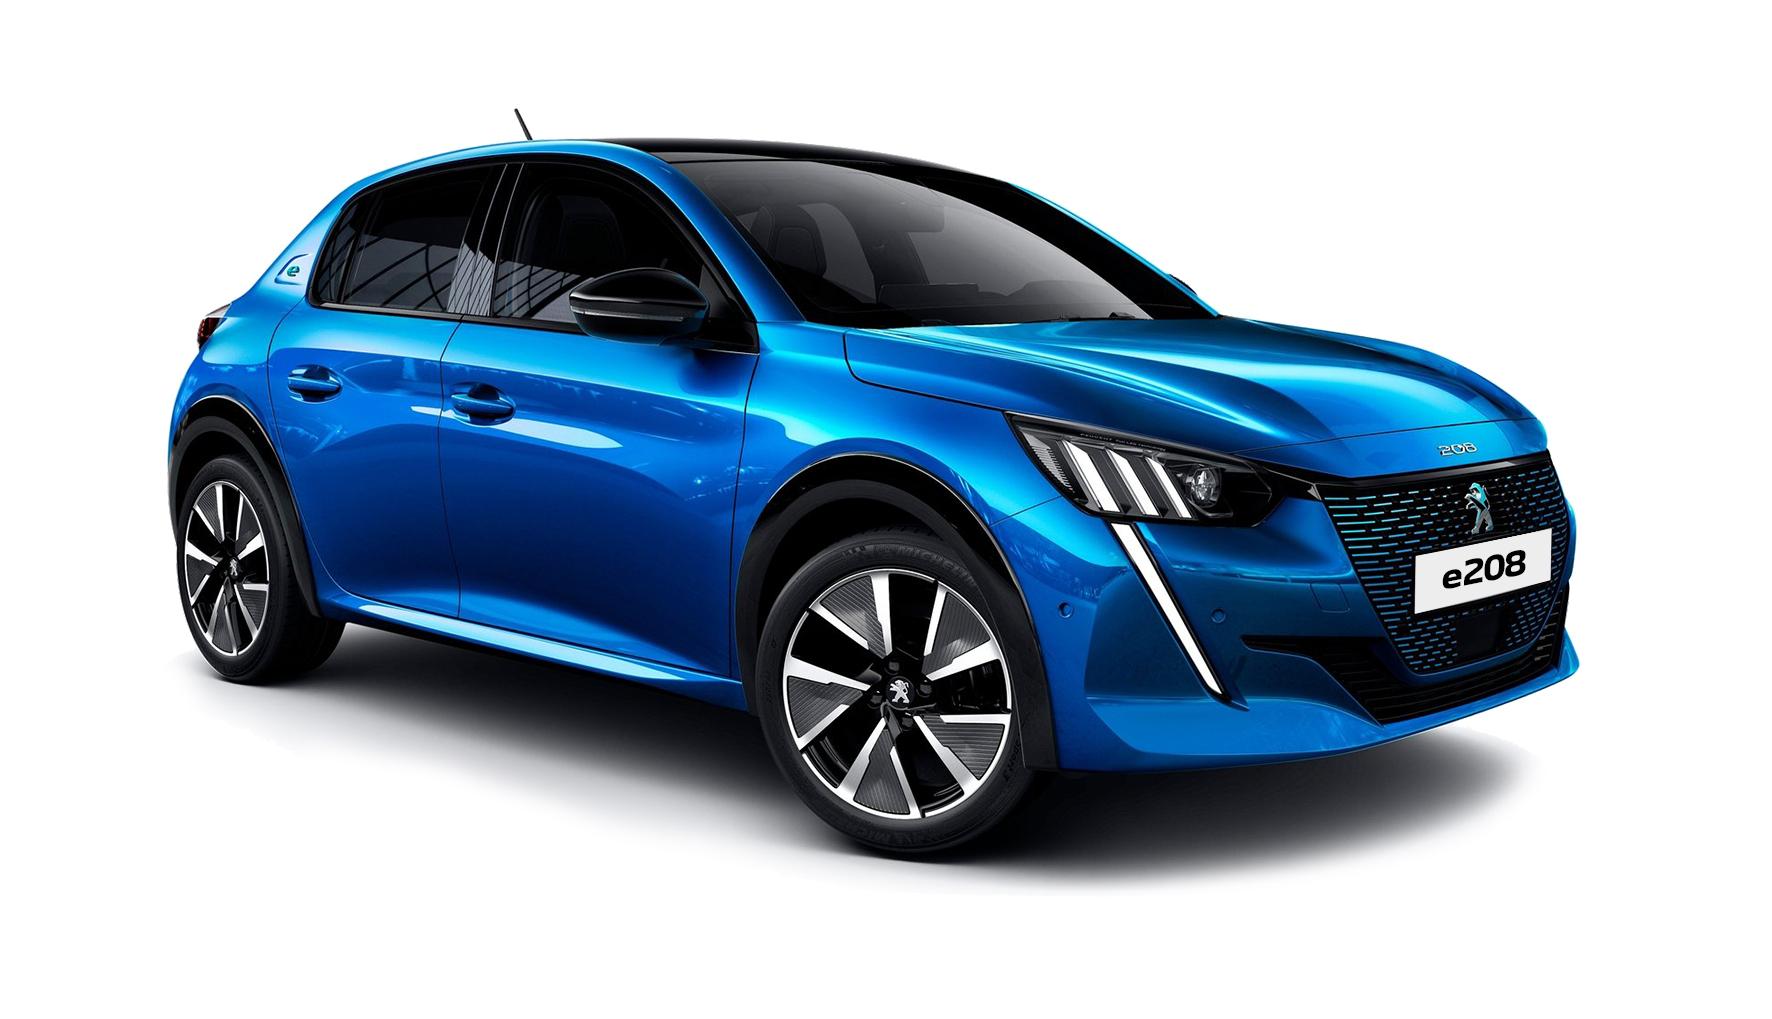 Peugeot_e208 electric car